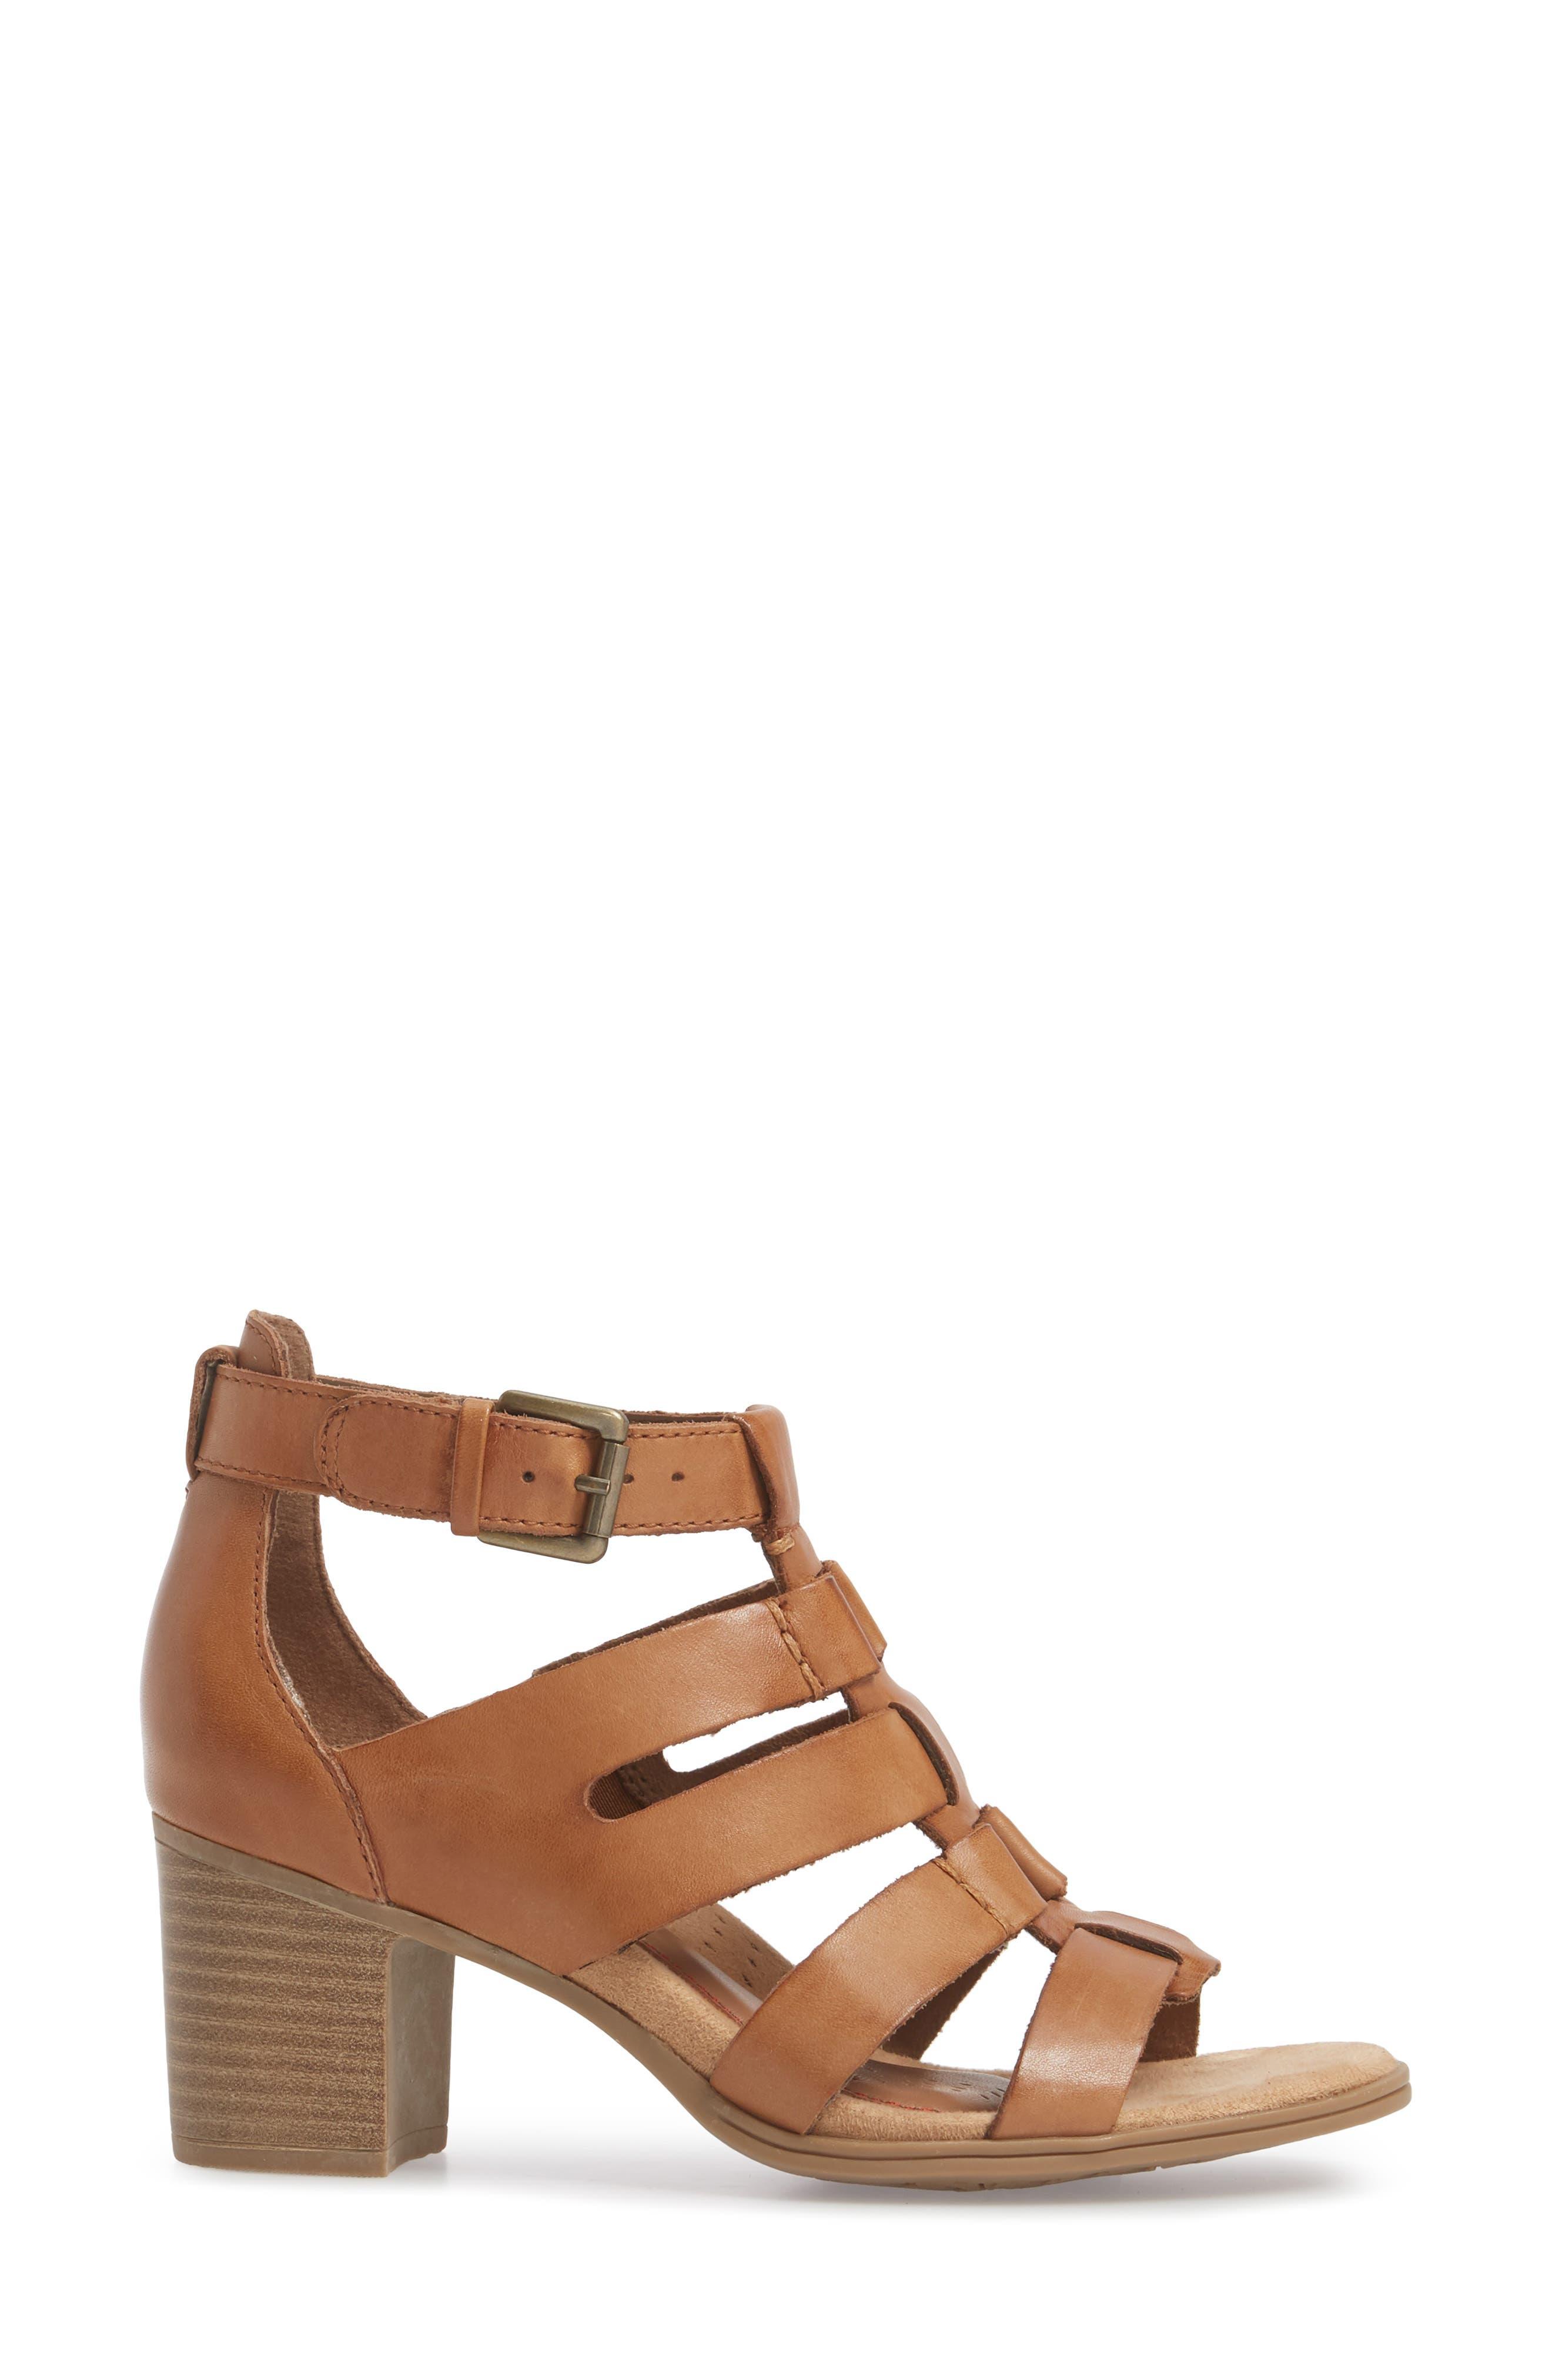 Hattie Block Heel Gladiator Sandal,                             Alternate thumbnail 3, color,                             231